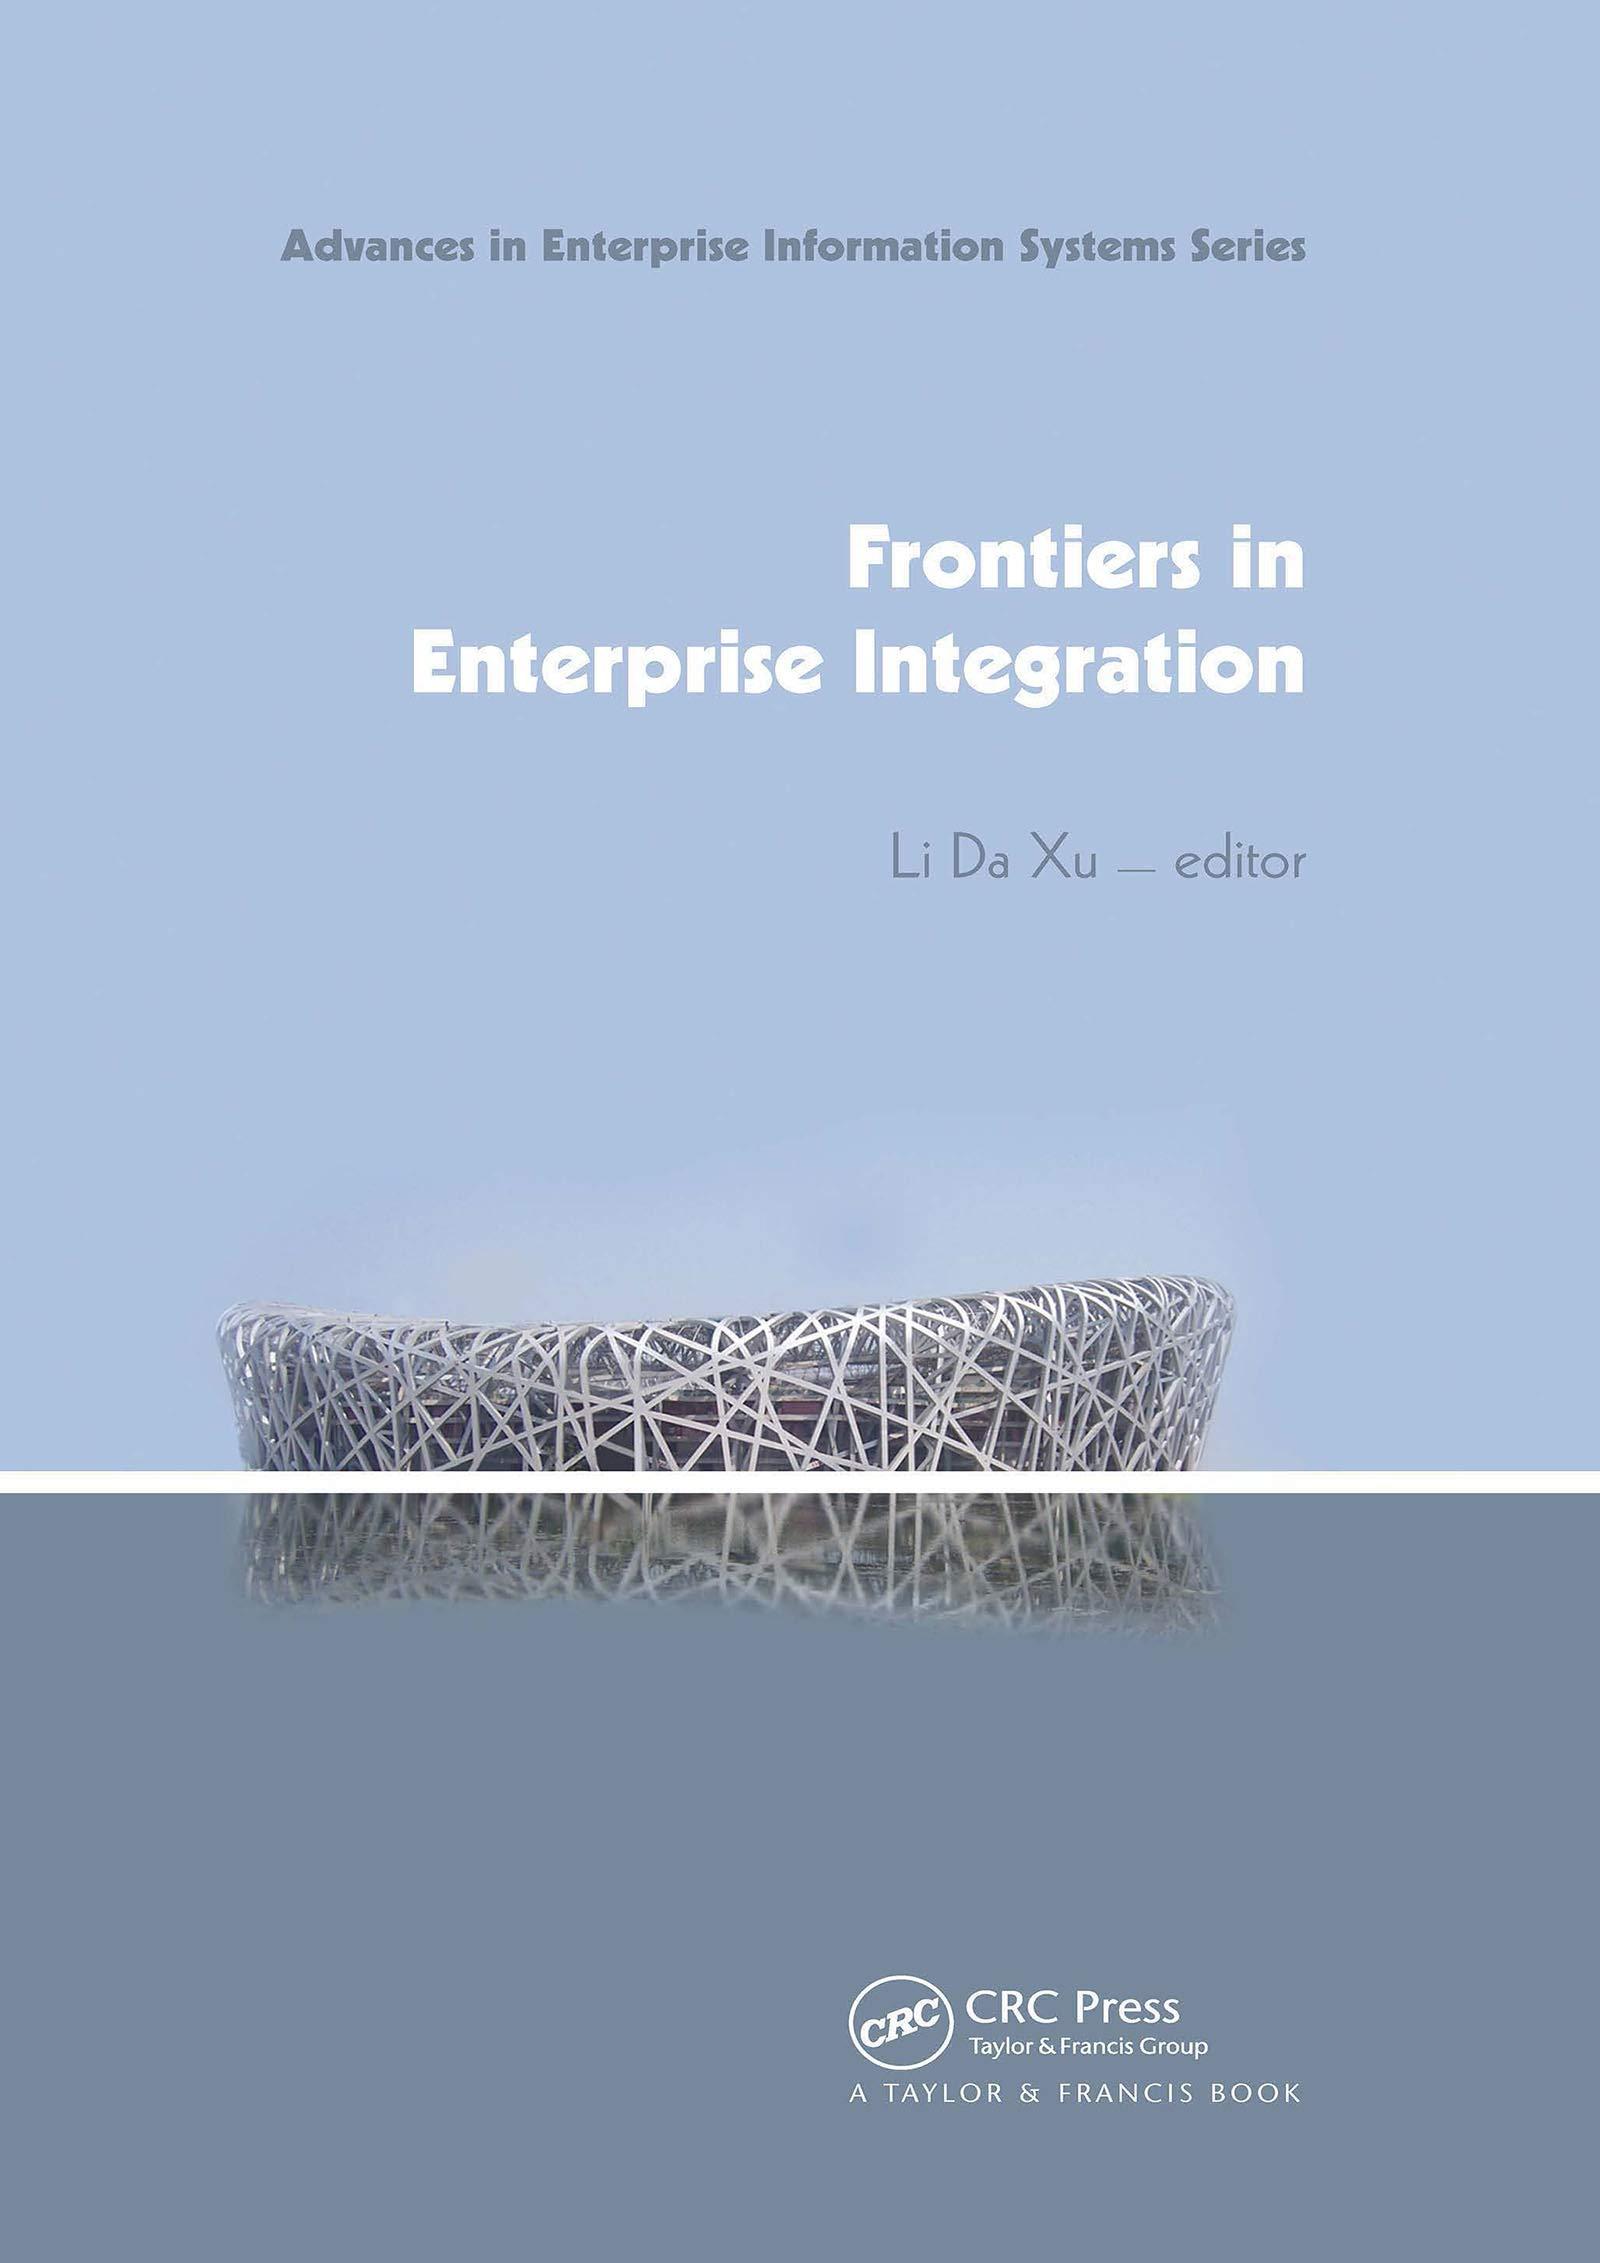 Frontiers in Enterprise Integration (Advances in Enterprise Information Systems)